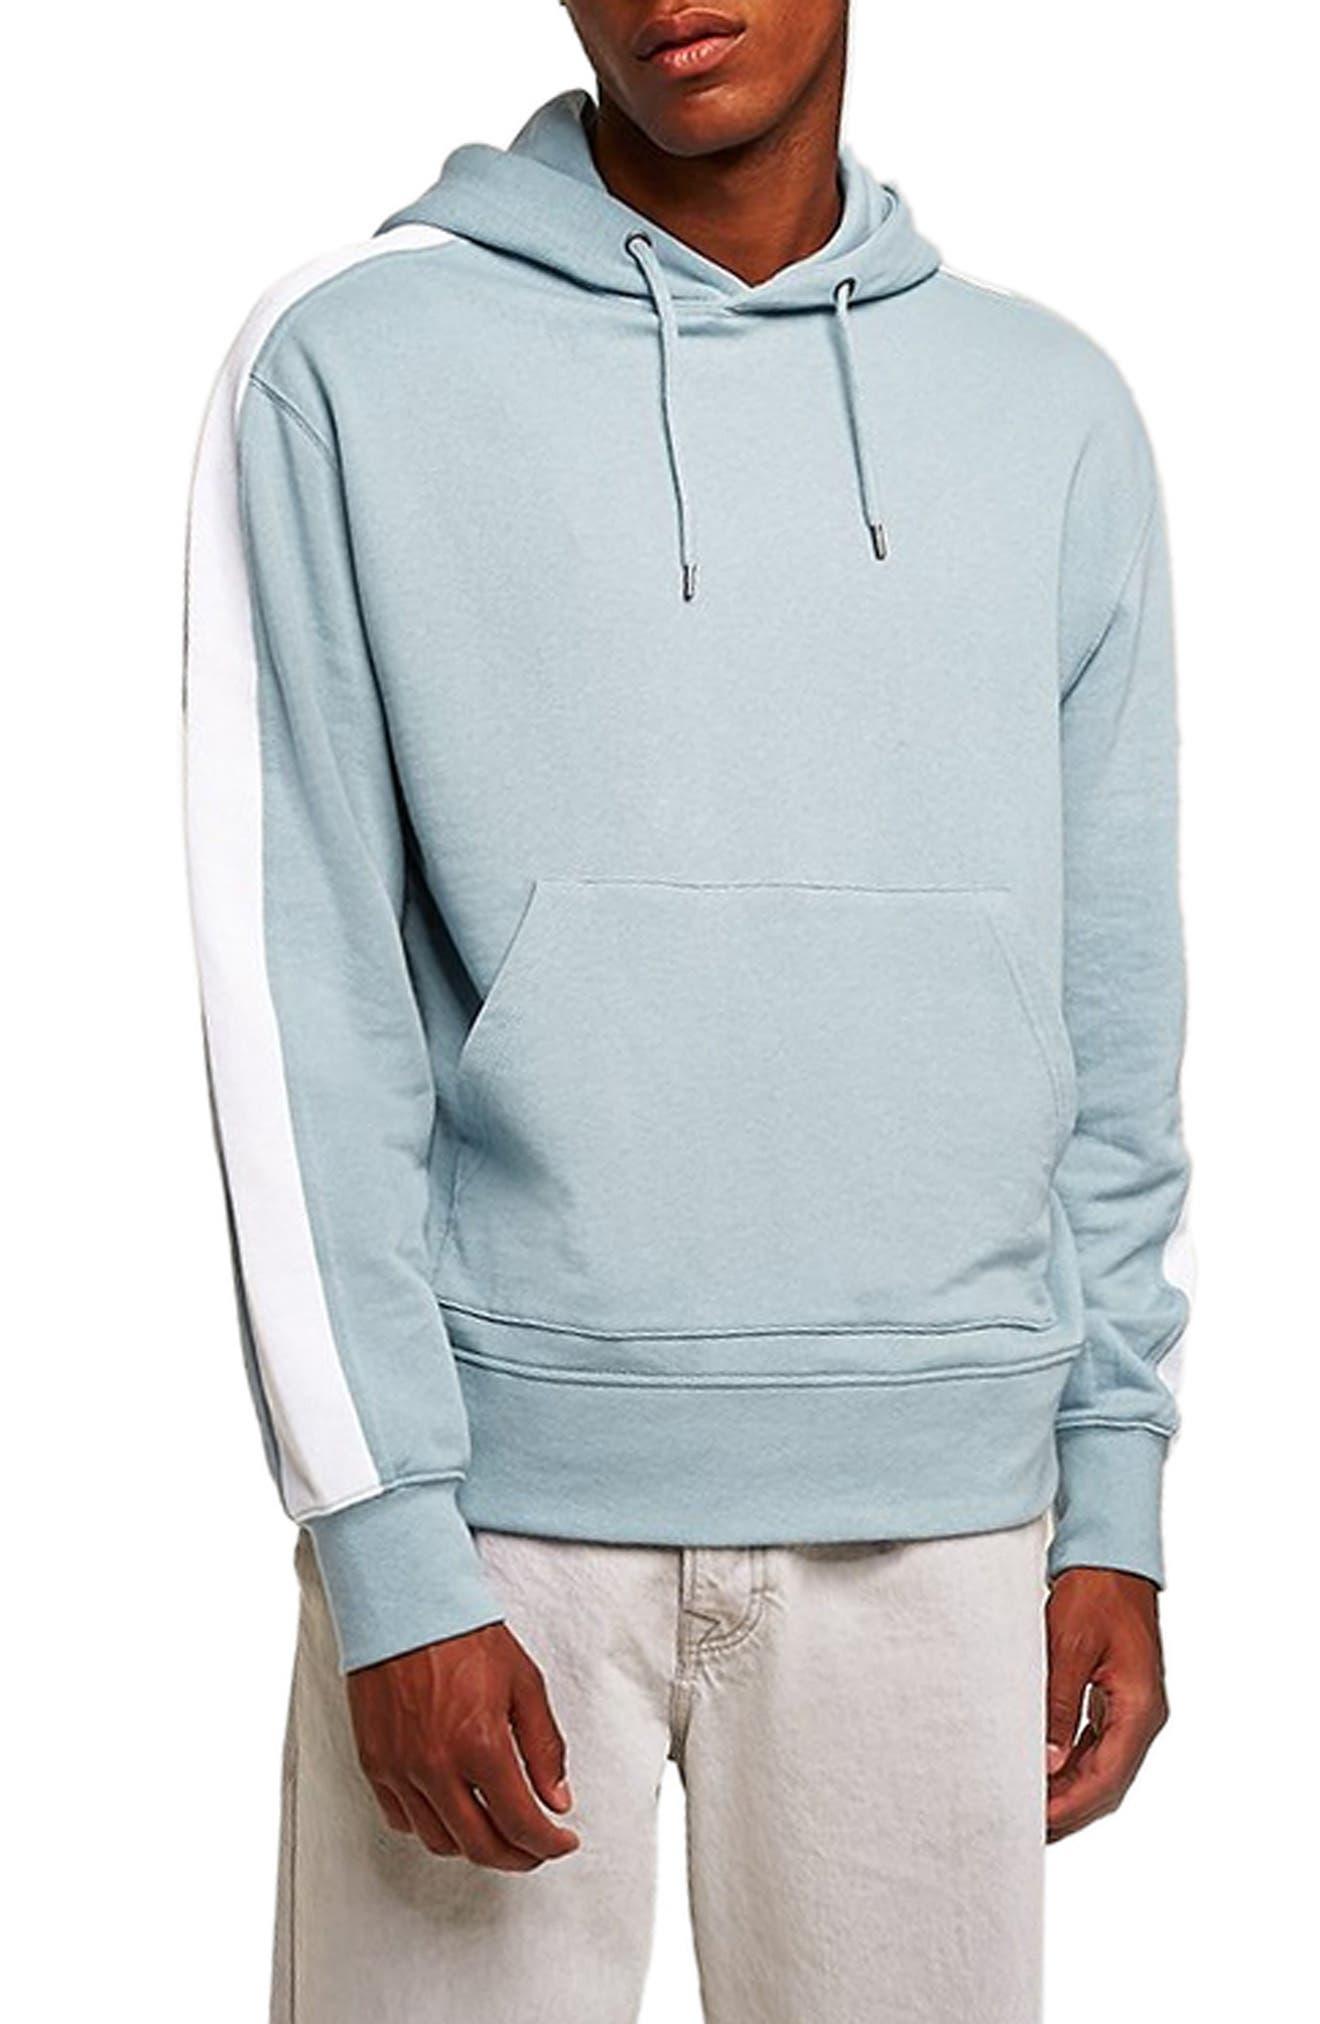 Colorblock Hooded Sweatshirt,                             Main thumbnail 1, color,                             400